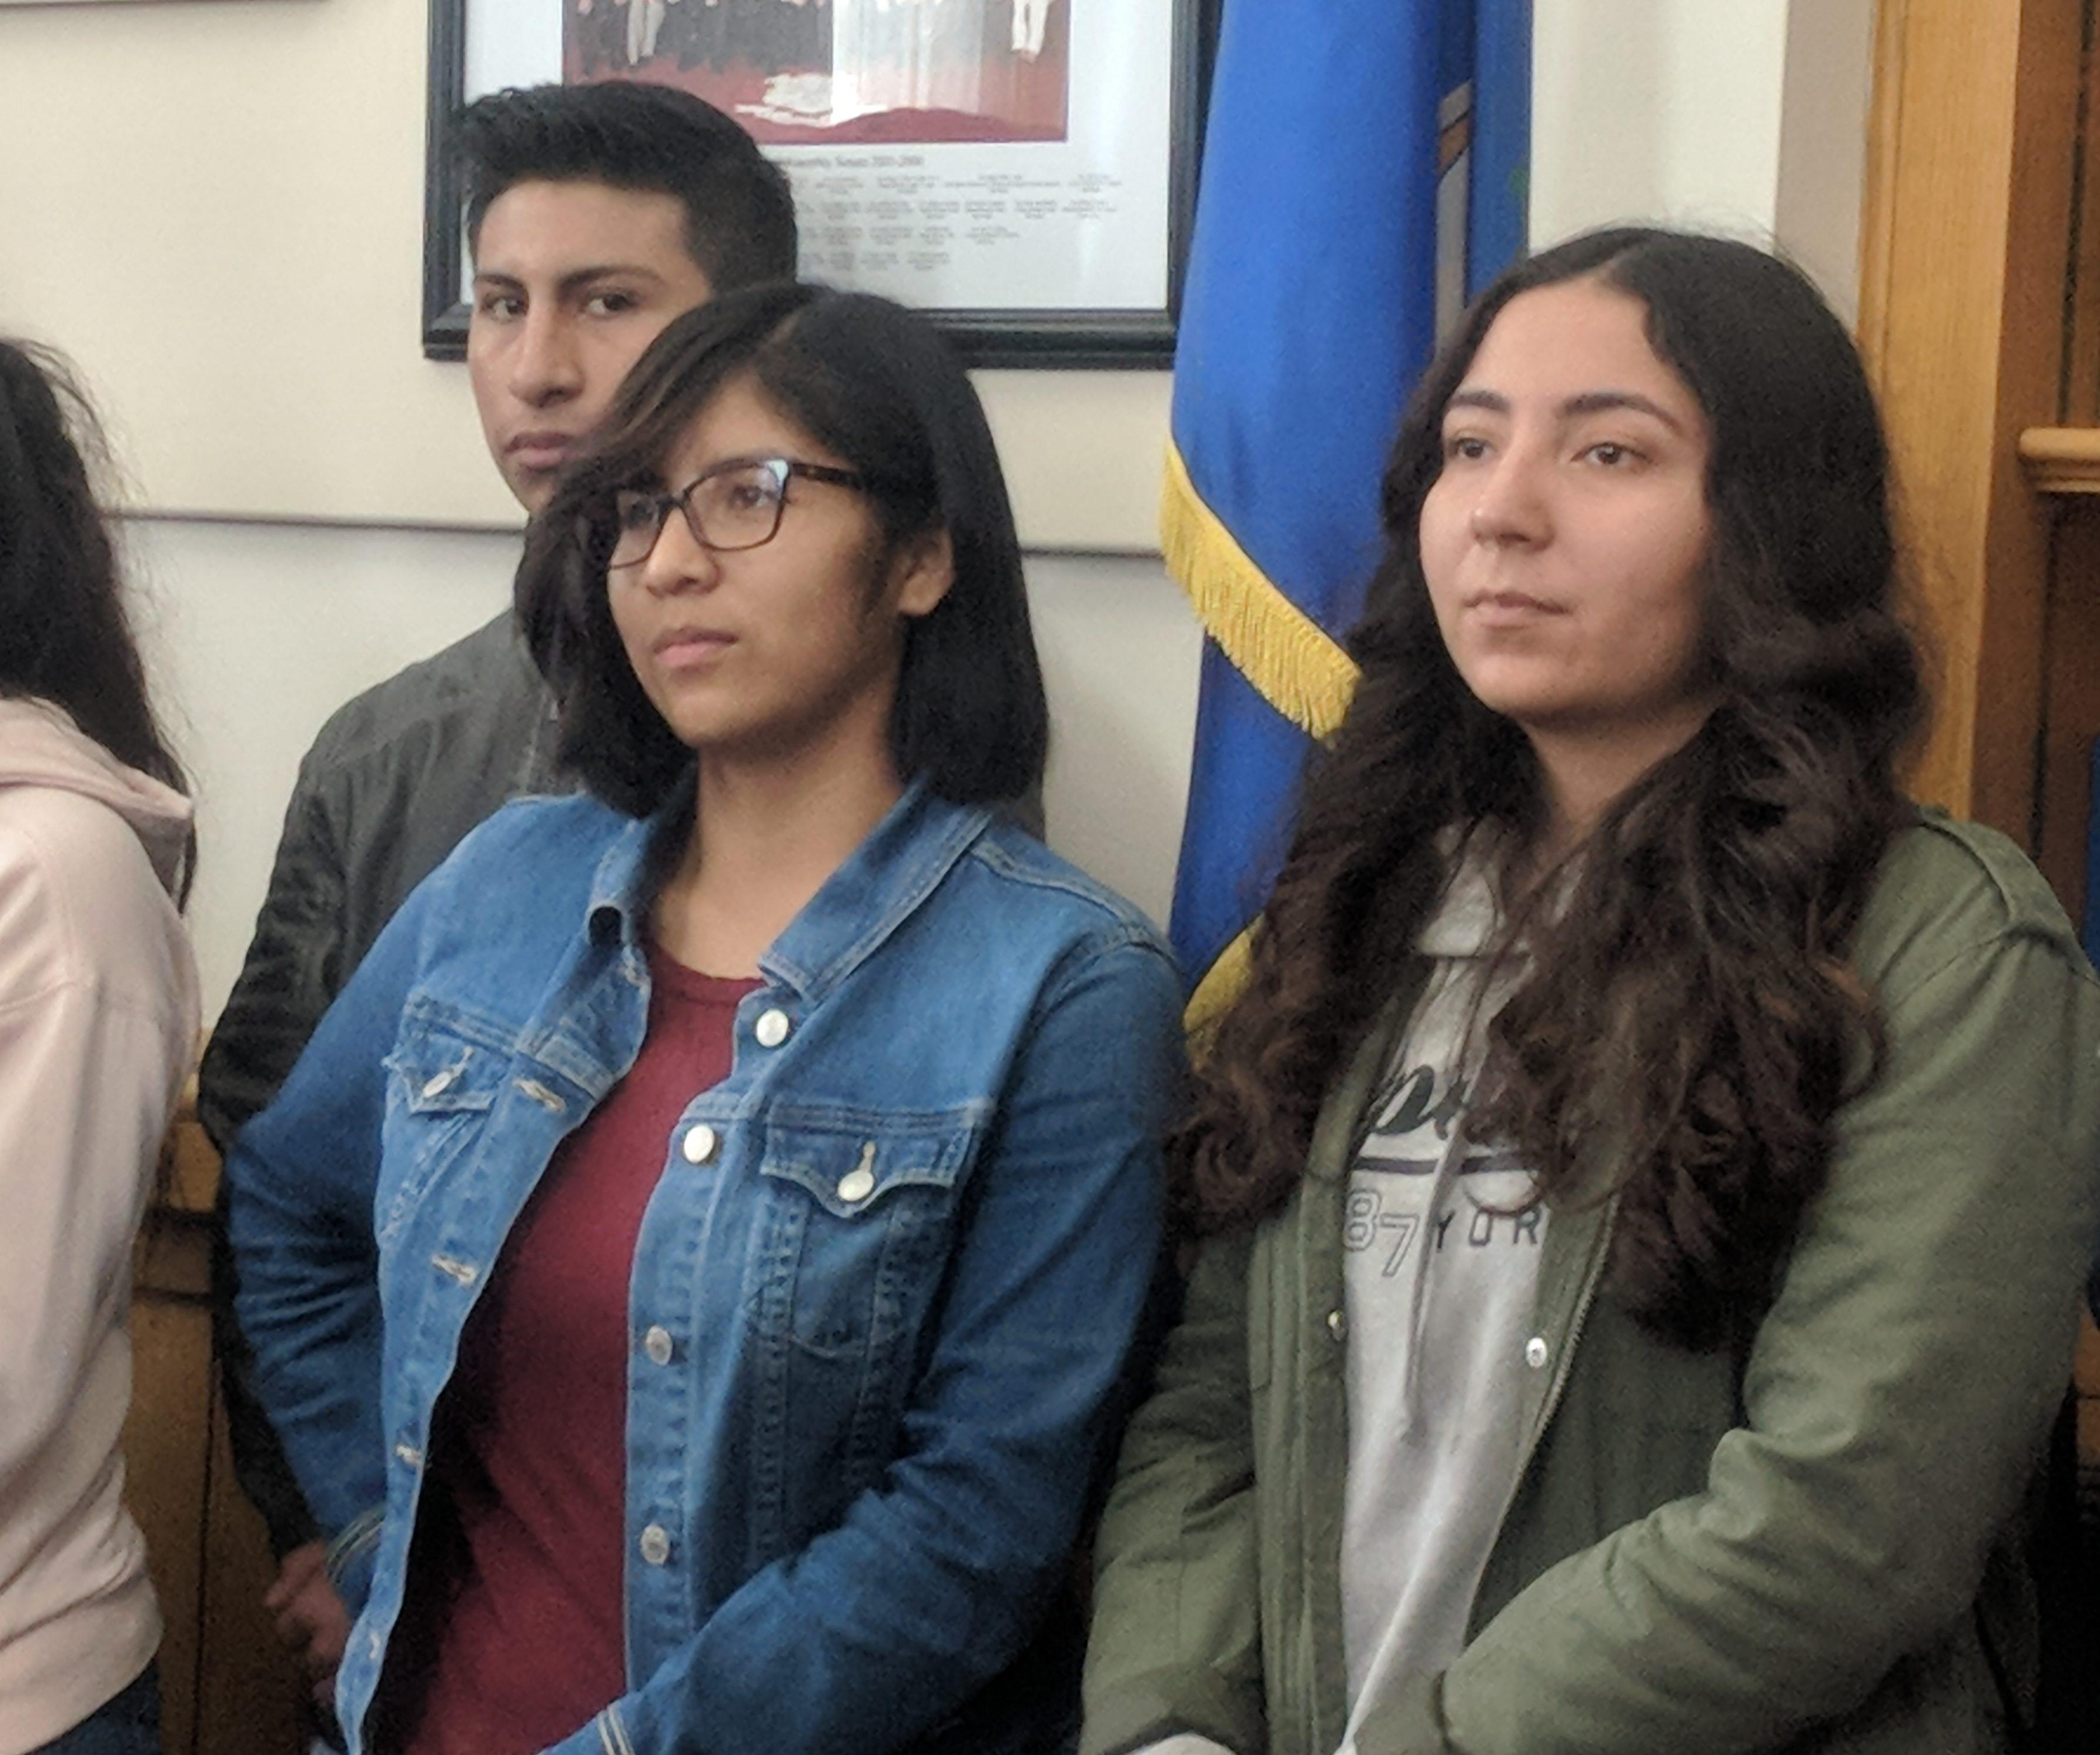 Legislators predict financial aid for undocumented will finally pass